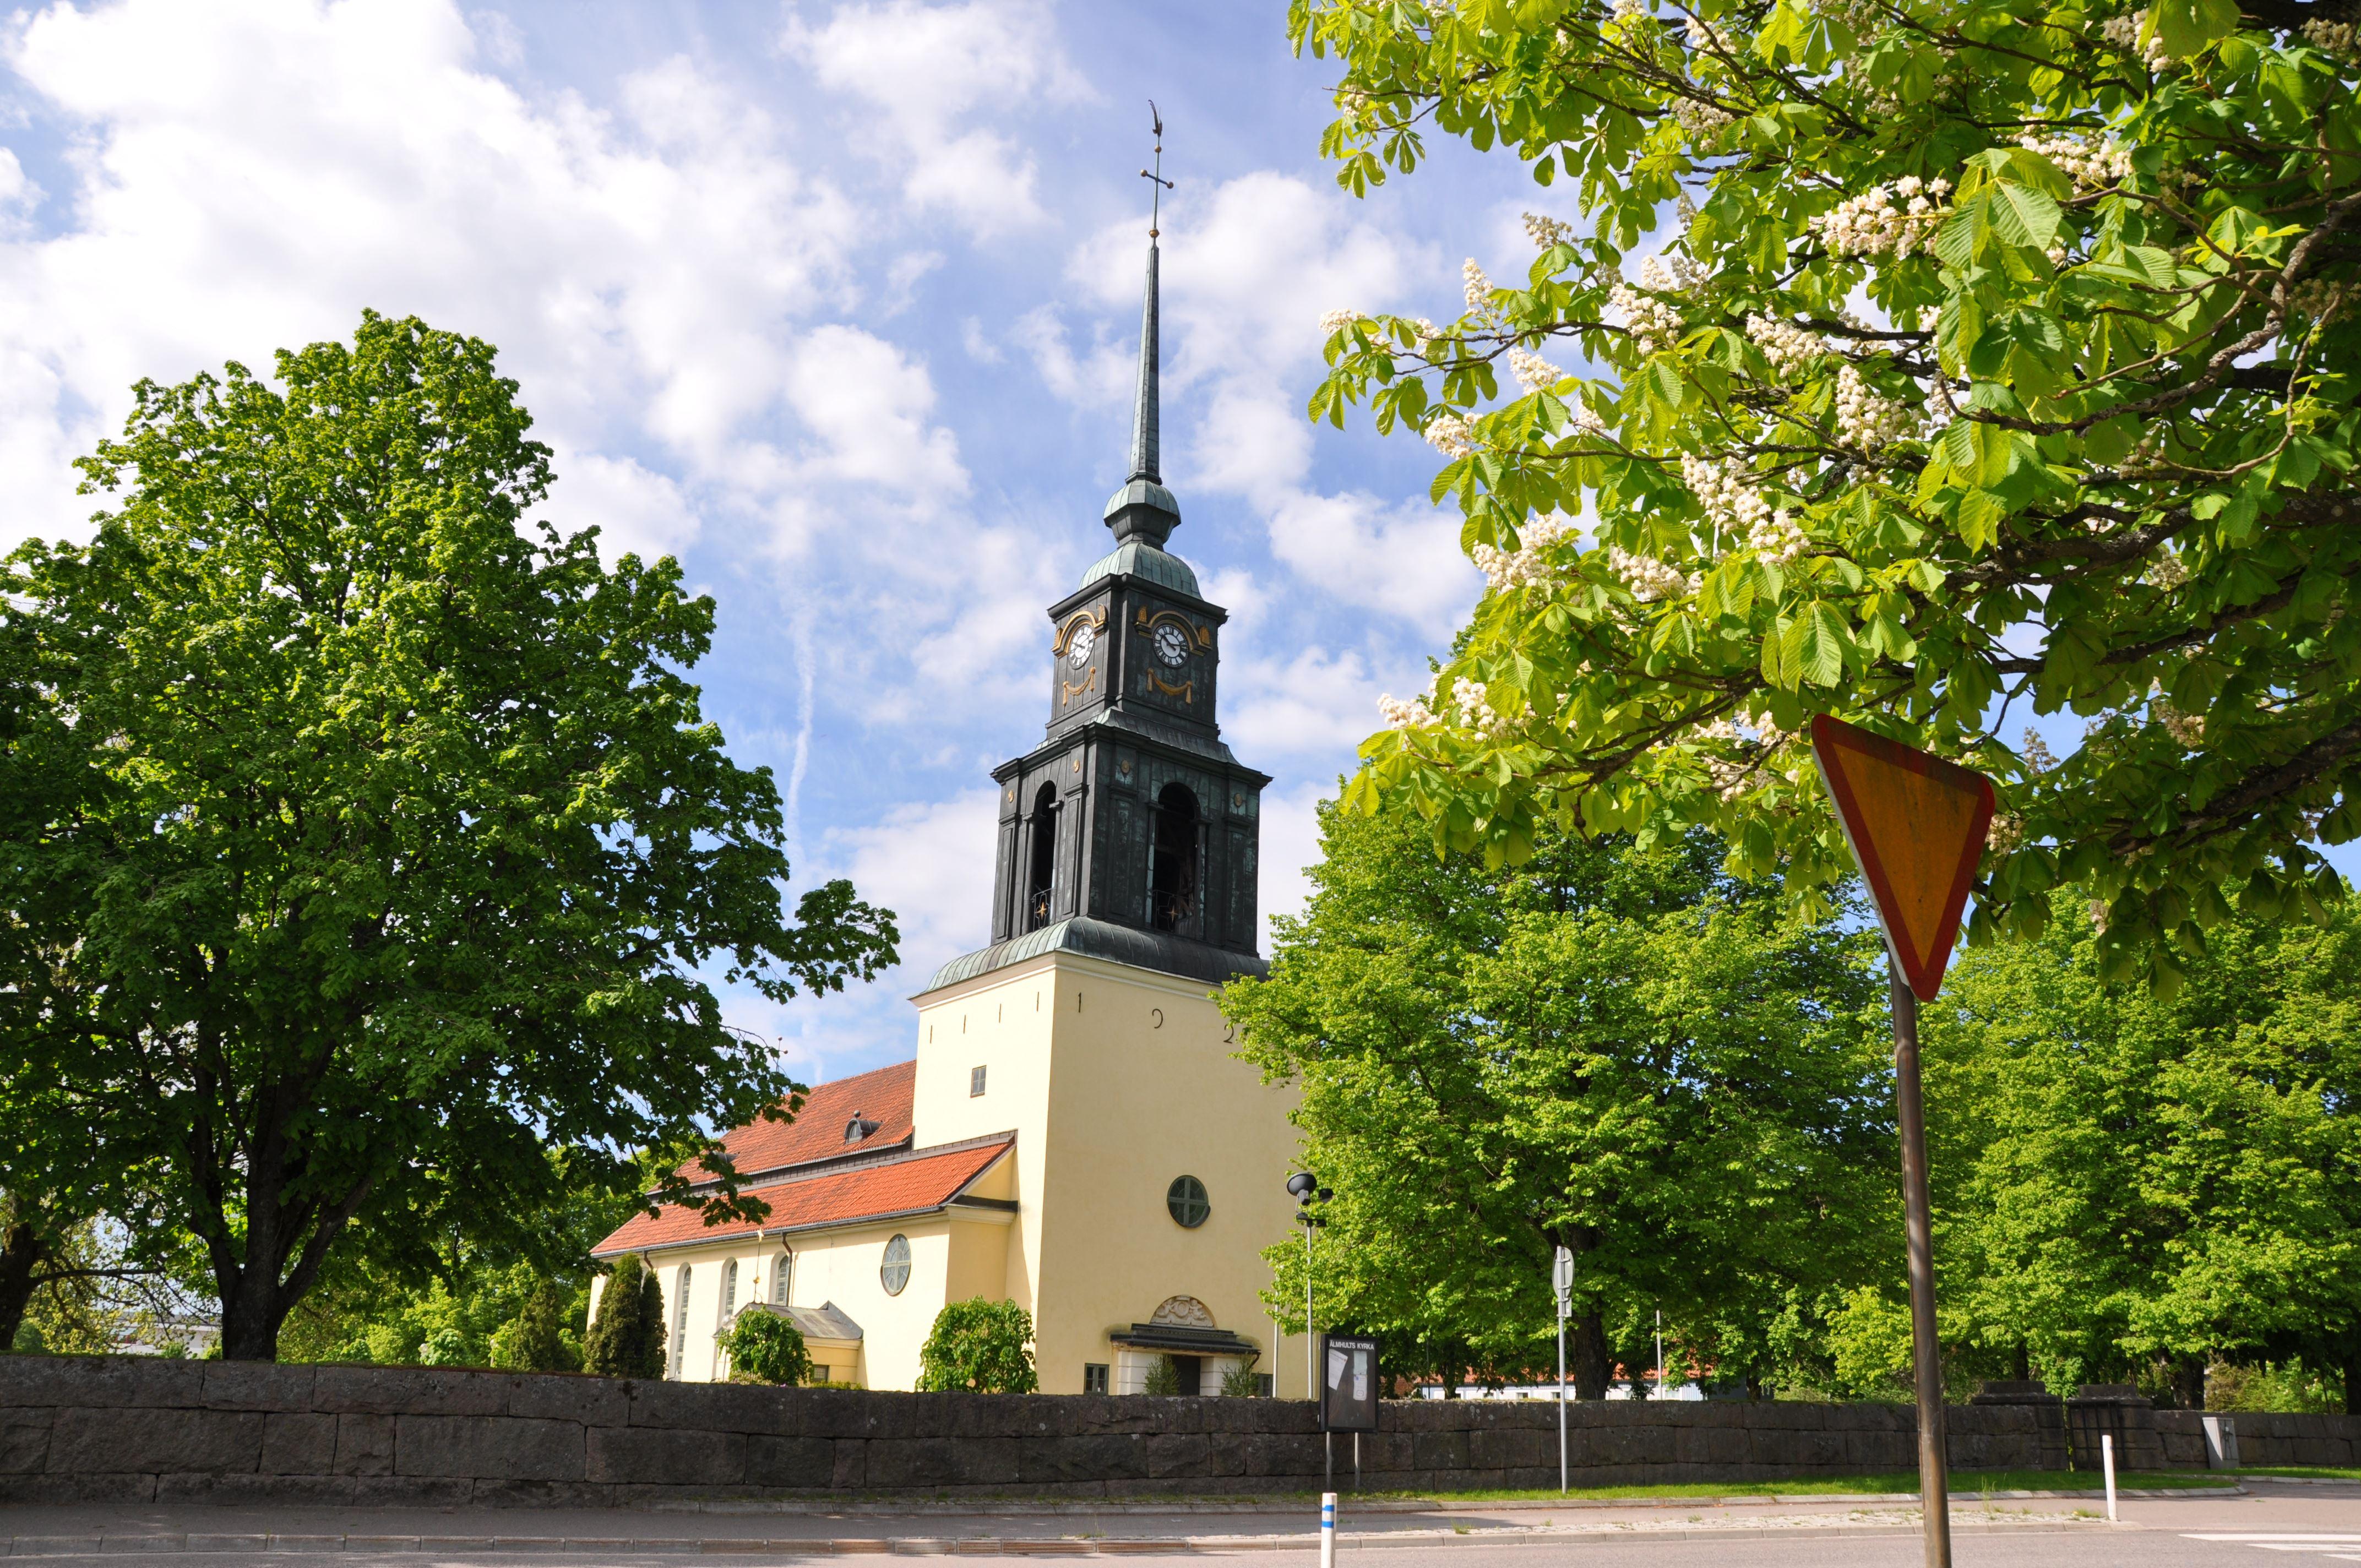 Älmhult church